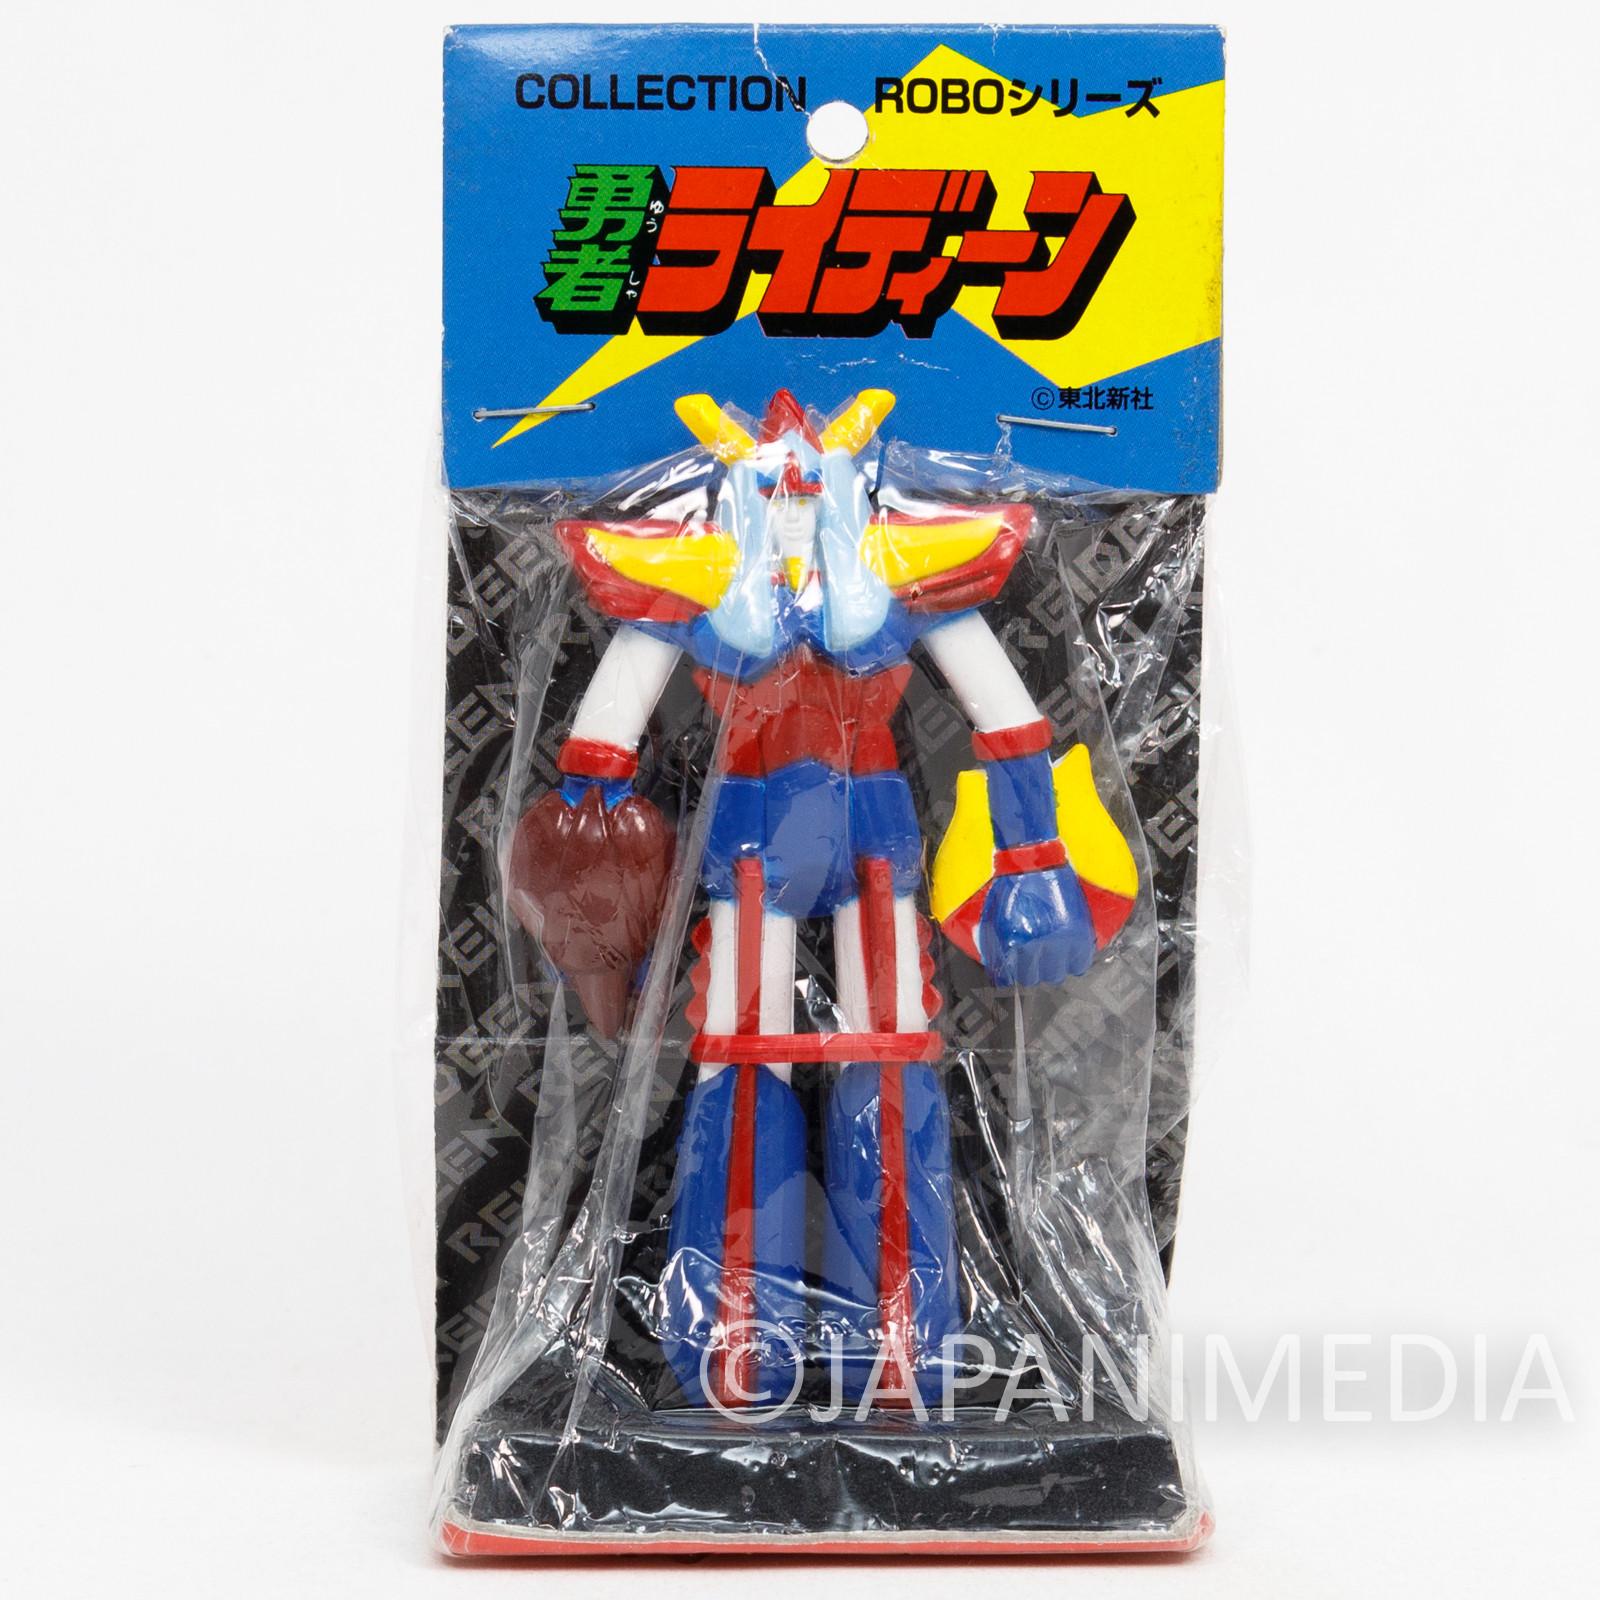 Retro Rydeen the Brave Figure Collection Robo JAPAN